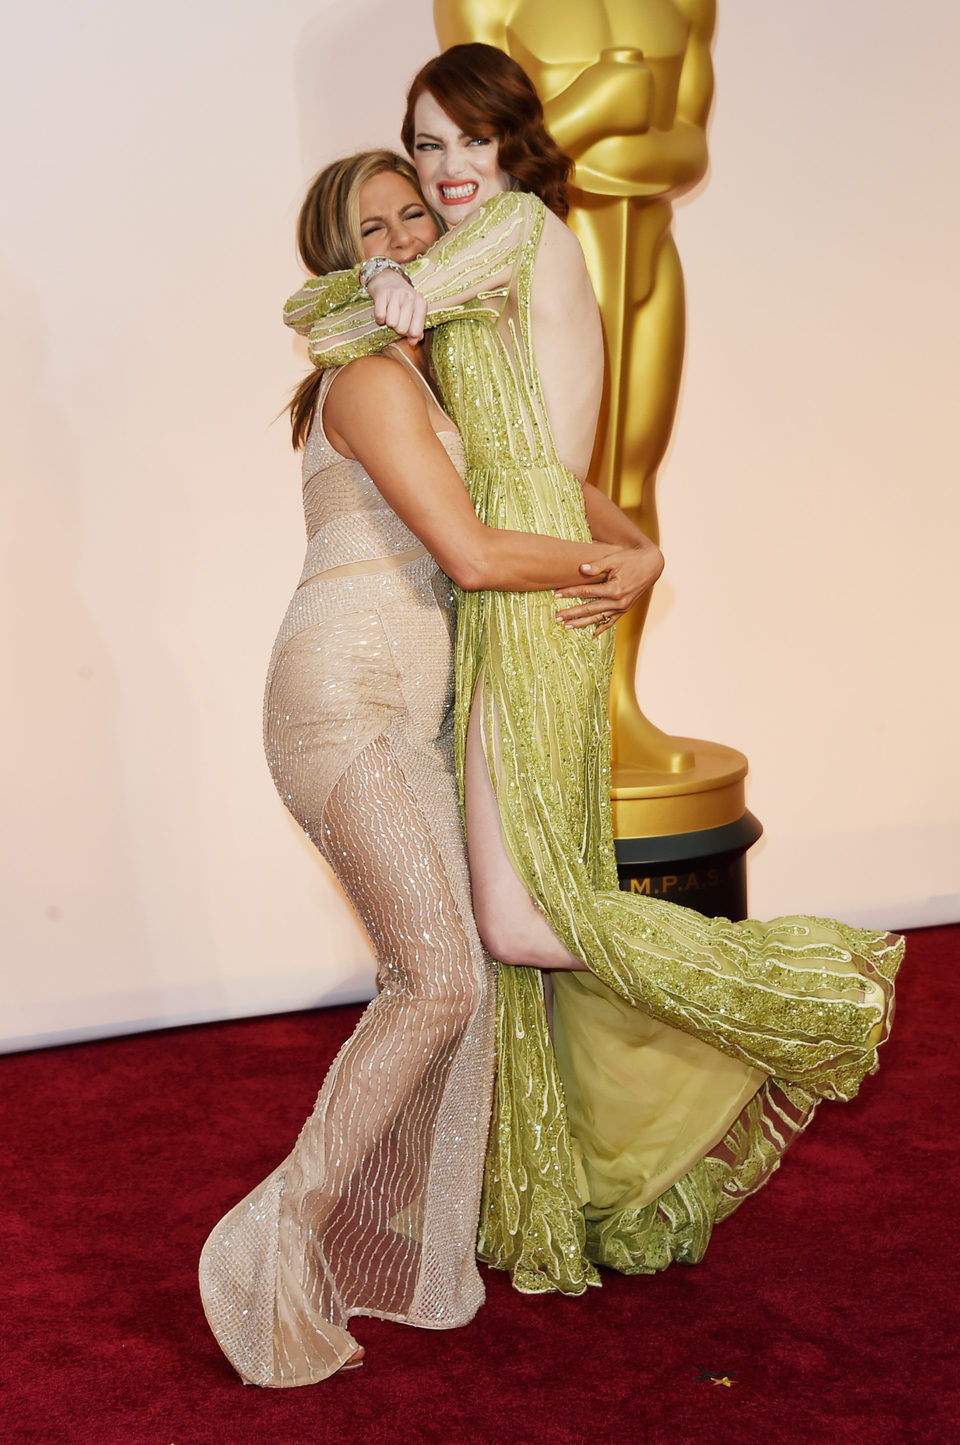 Jennifer Aniston and Emma Stone play at the Oscar 2015